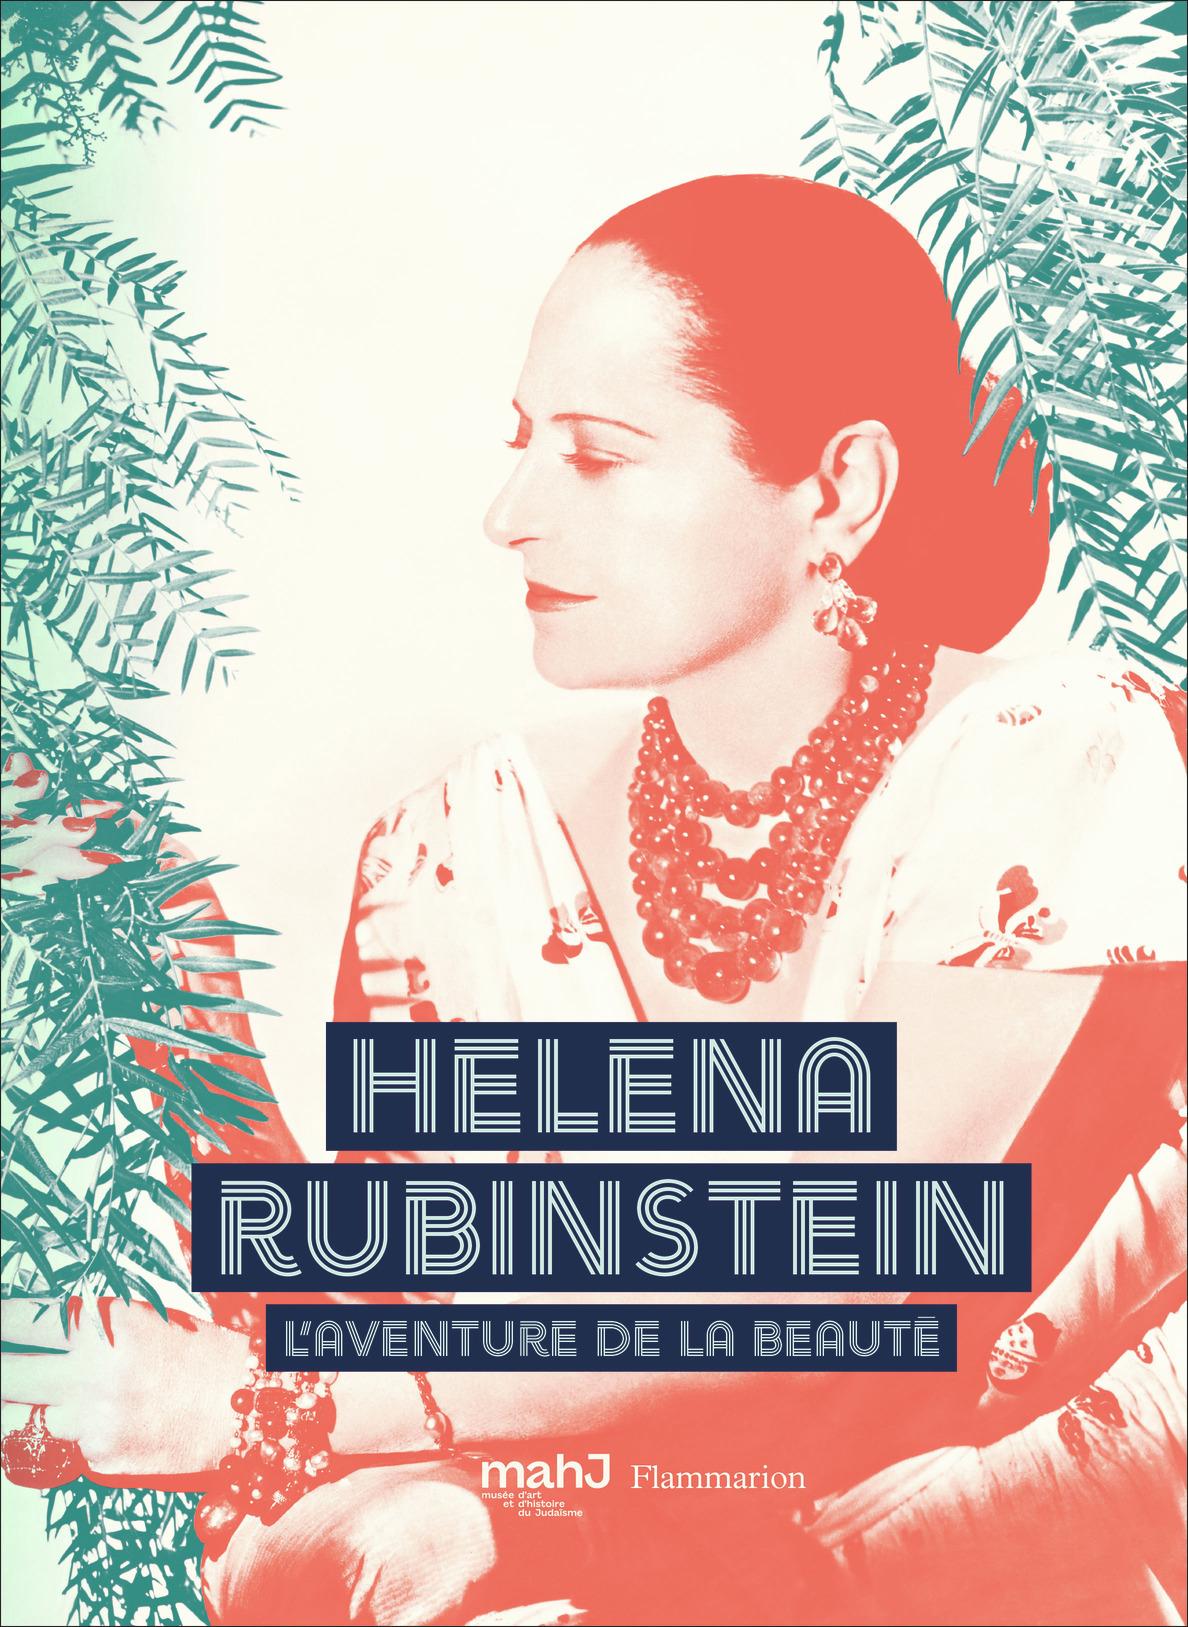 HELENA RUBINSTEIN - L'AVENTURE DE LA BEAUTE